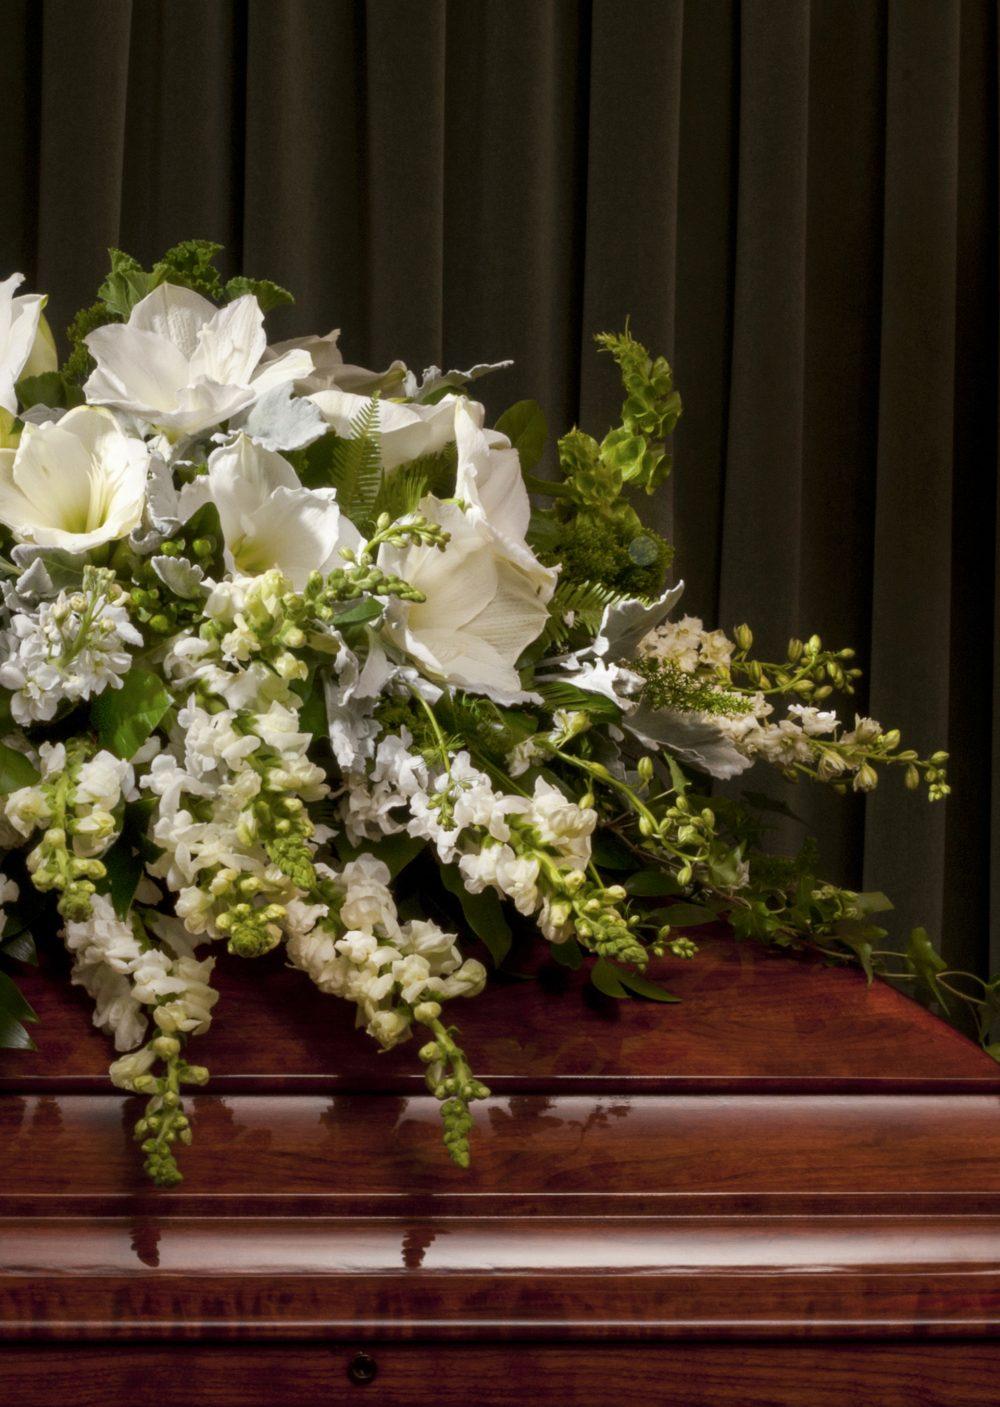 Funeral Casket Sprays